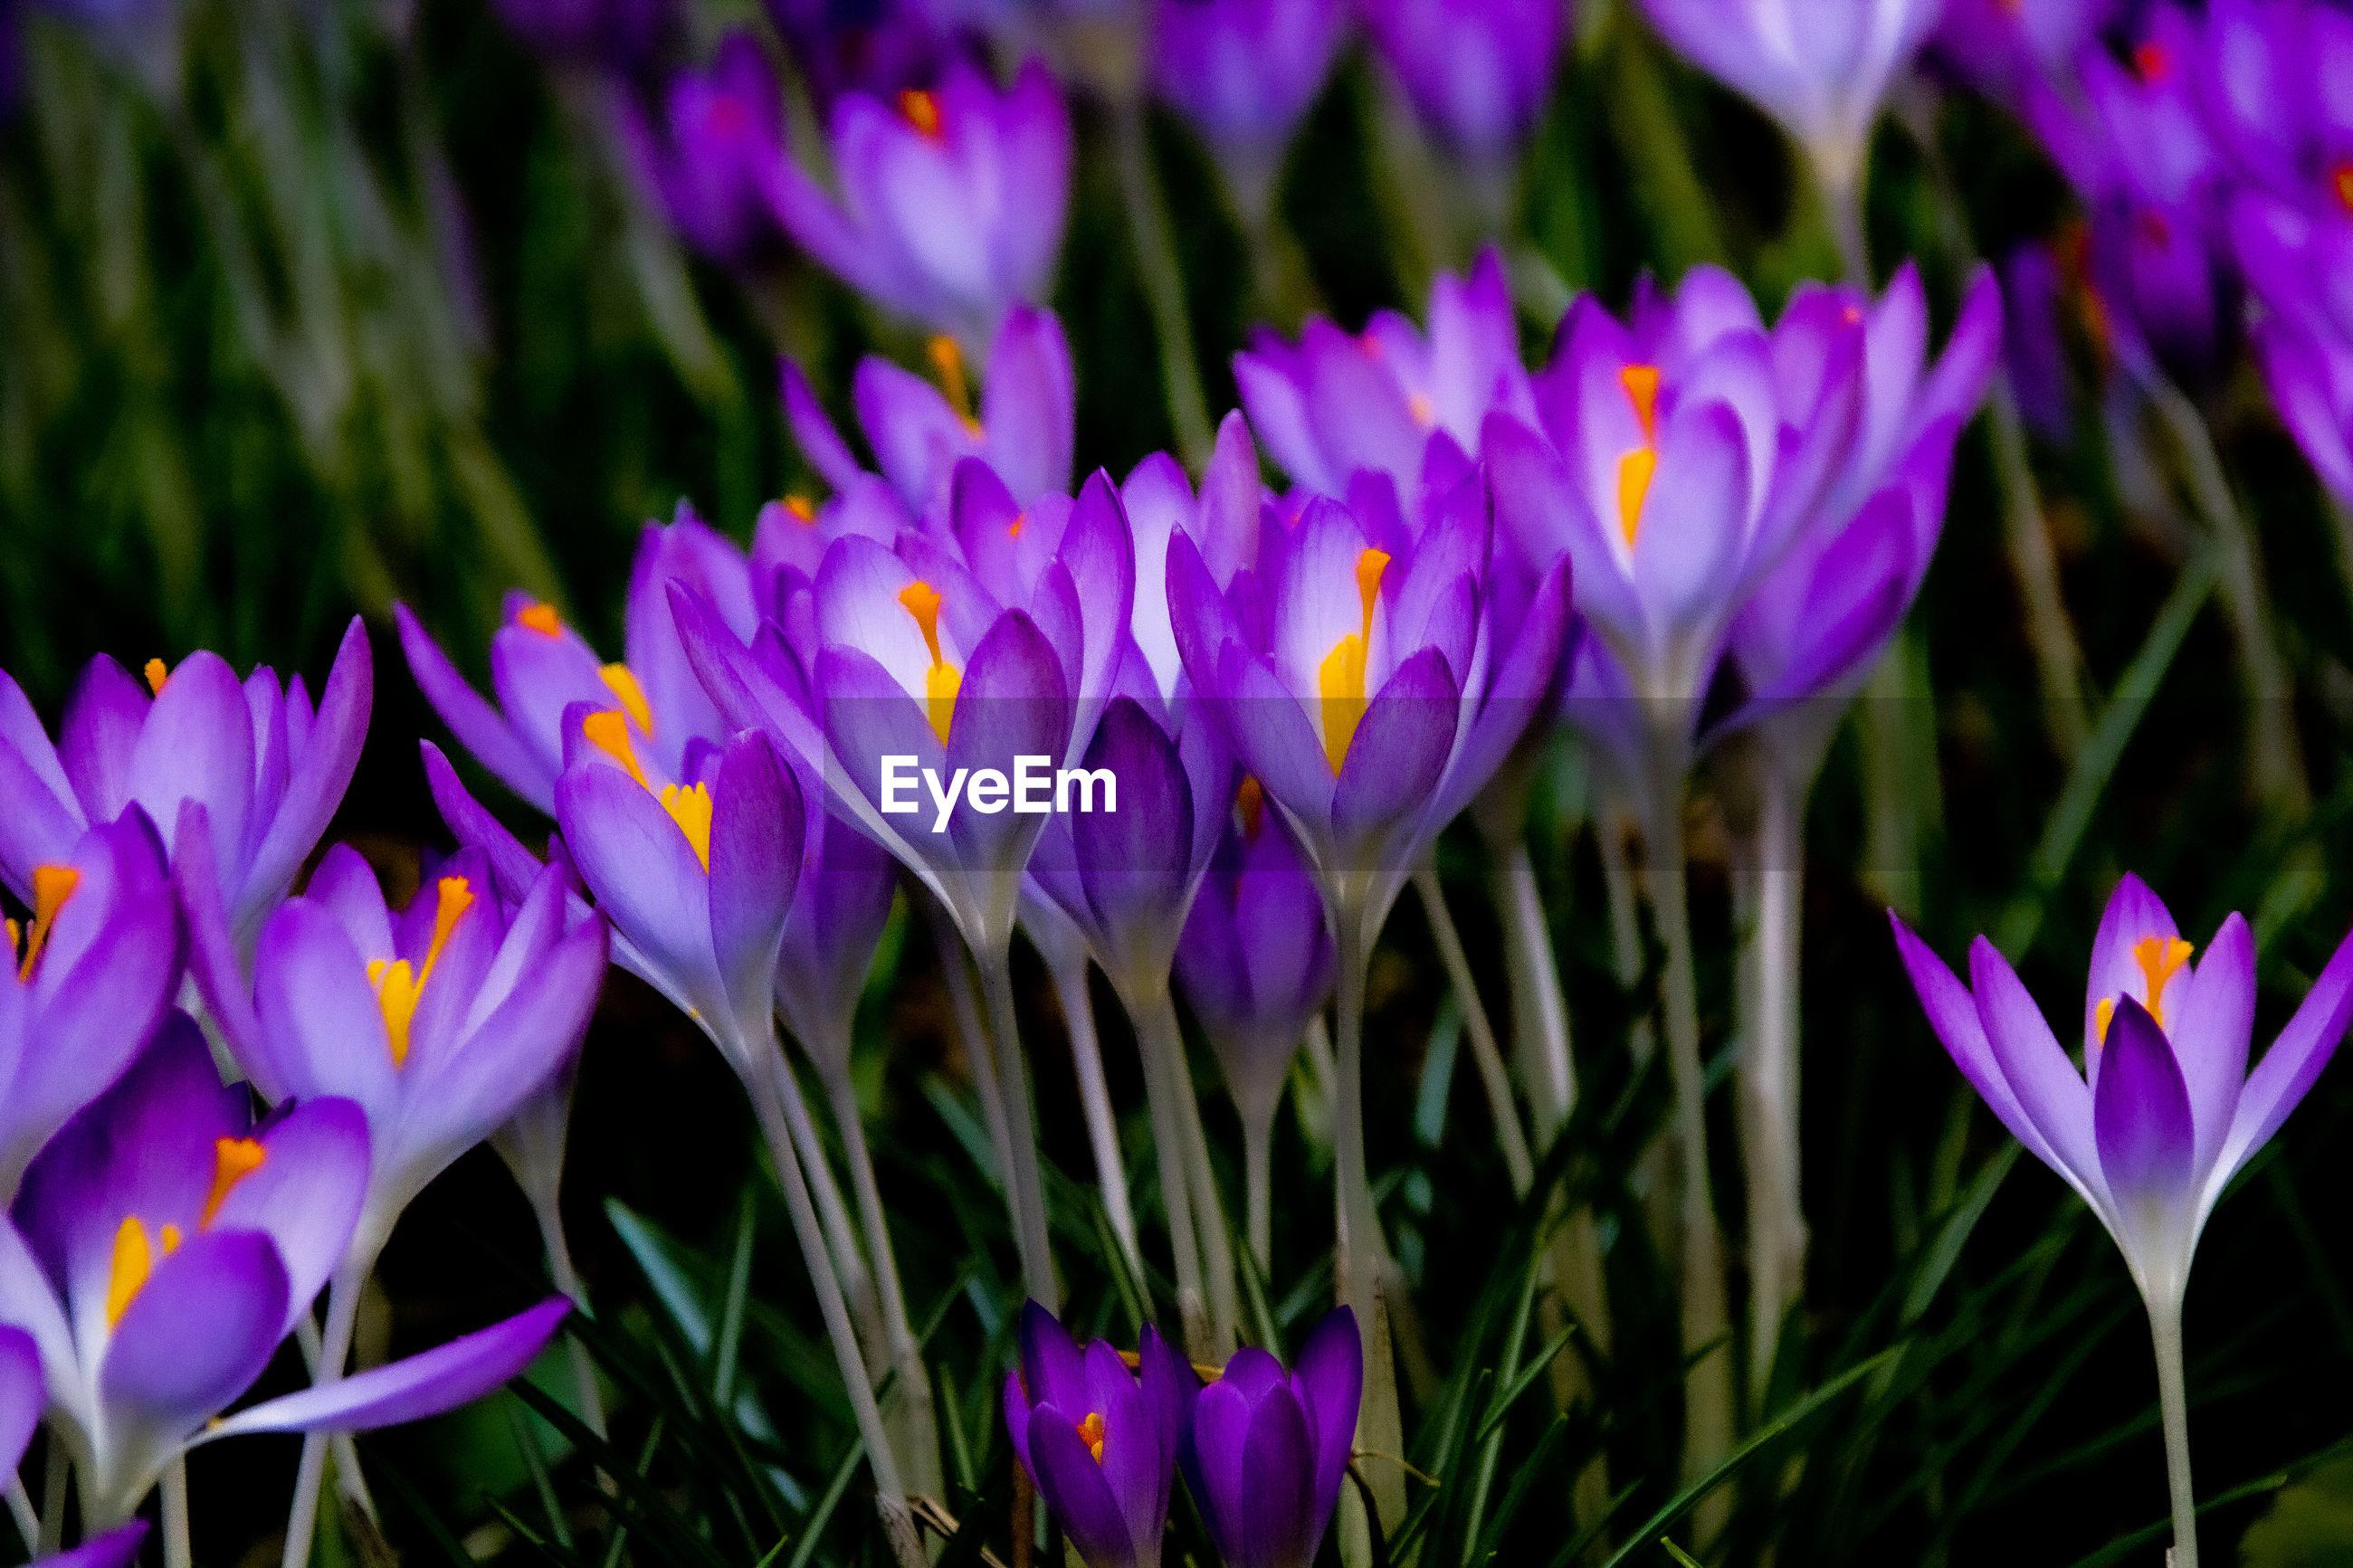 CLOSE-UP OF PURPLE CROCUS FLOWERS GROWING ON LAND